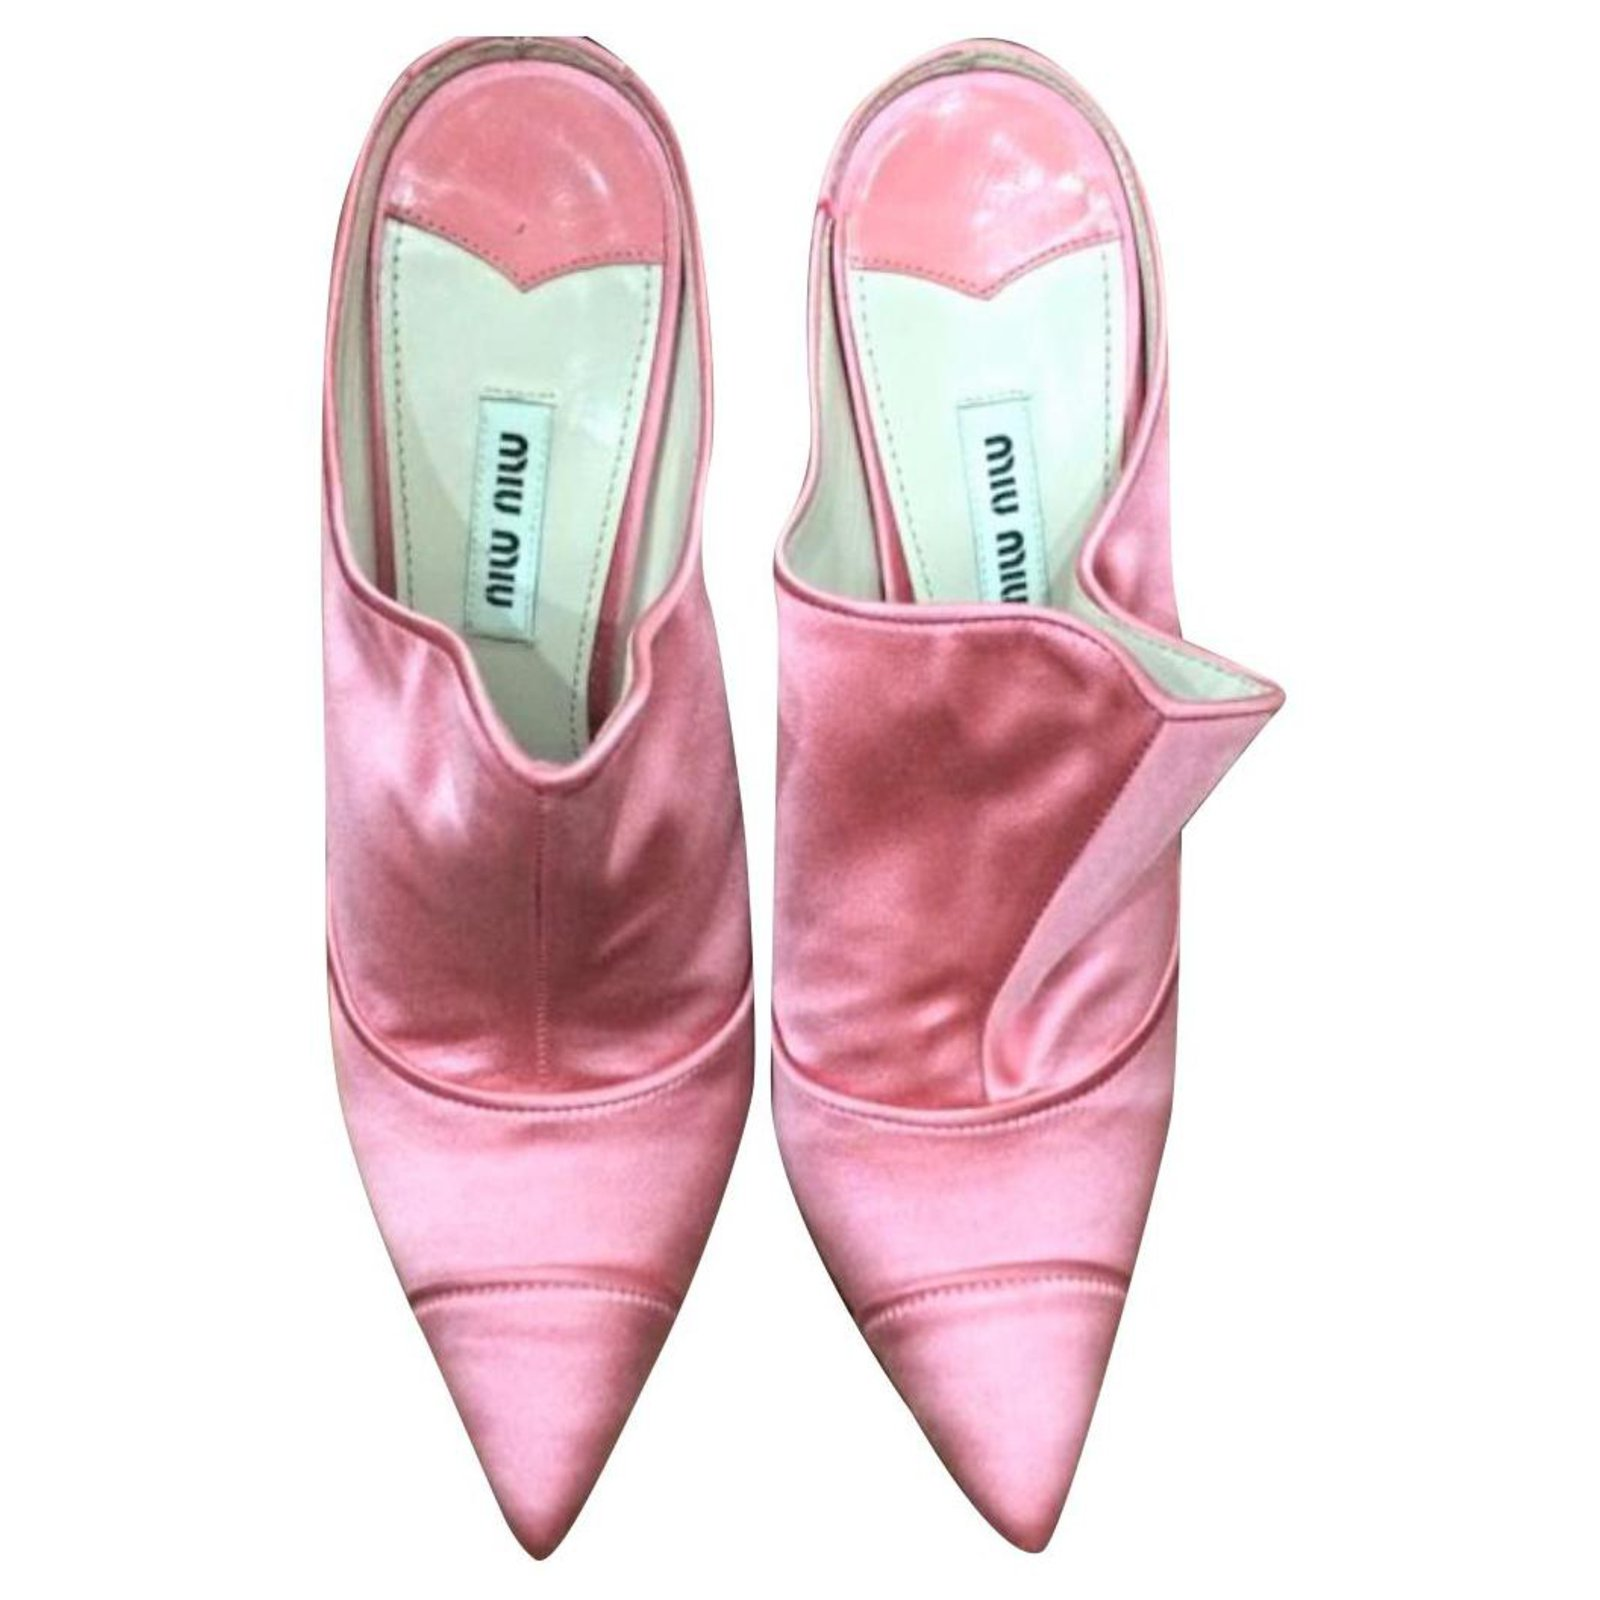 Miu Miu Miu Miu Pink satin mules heels